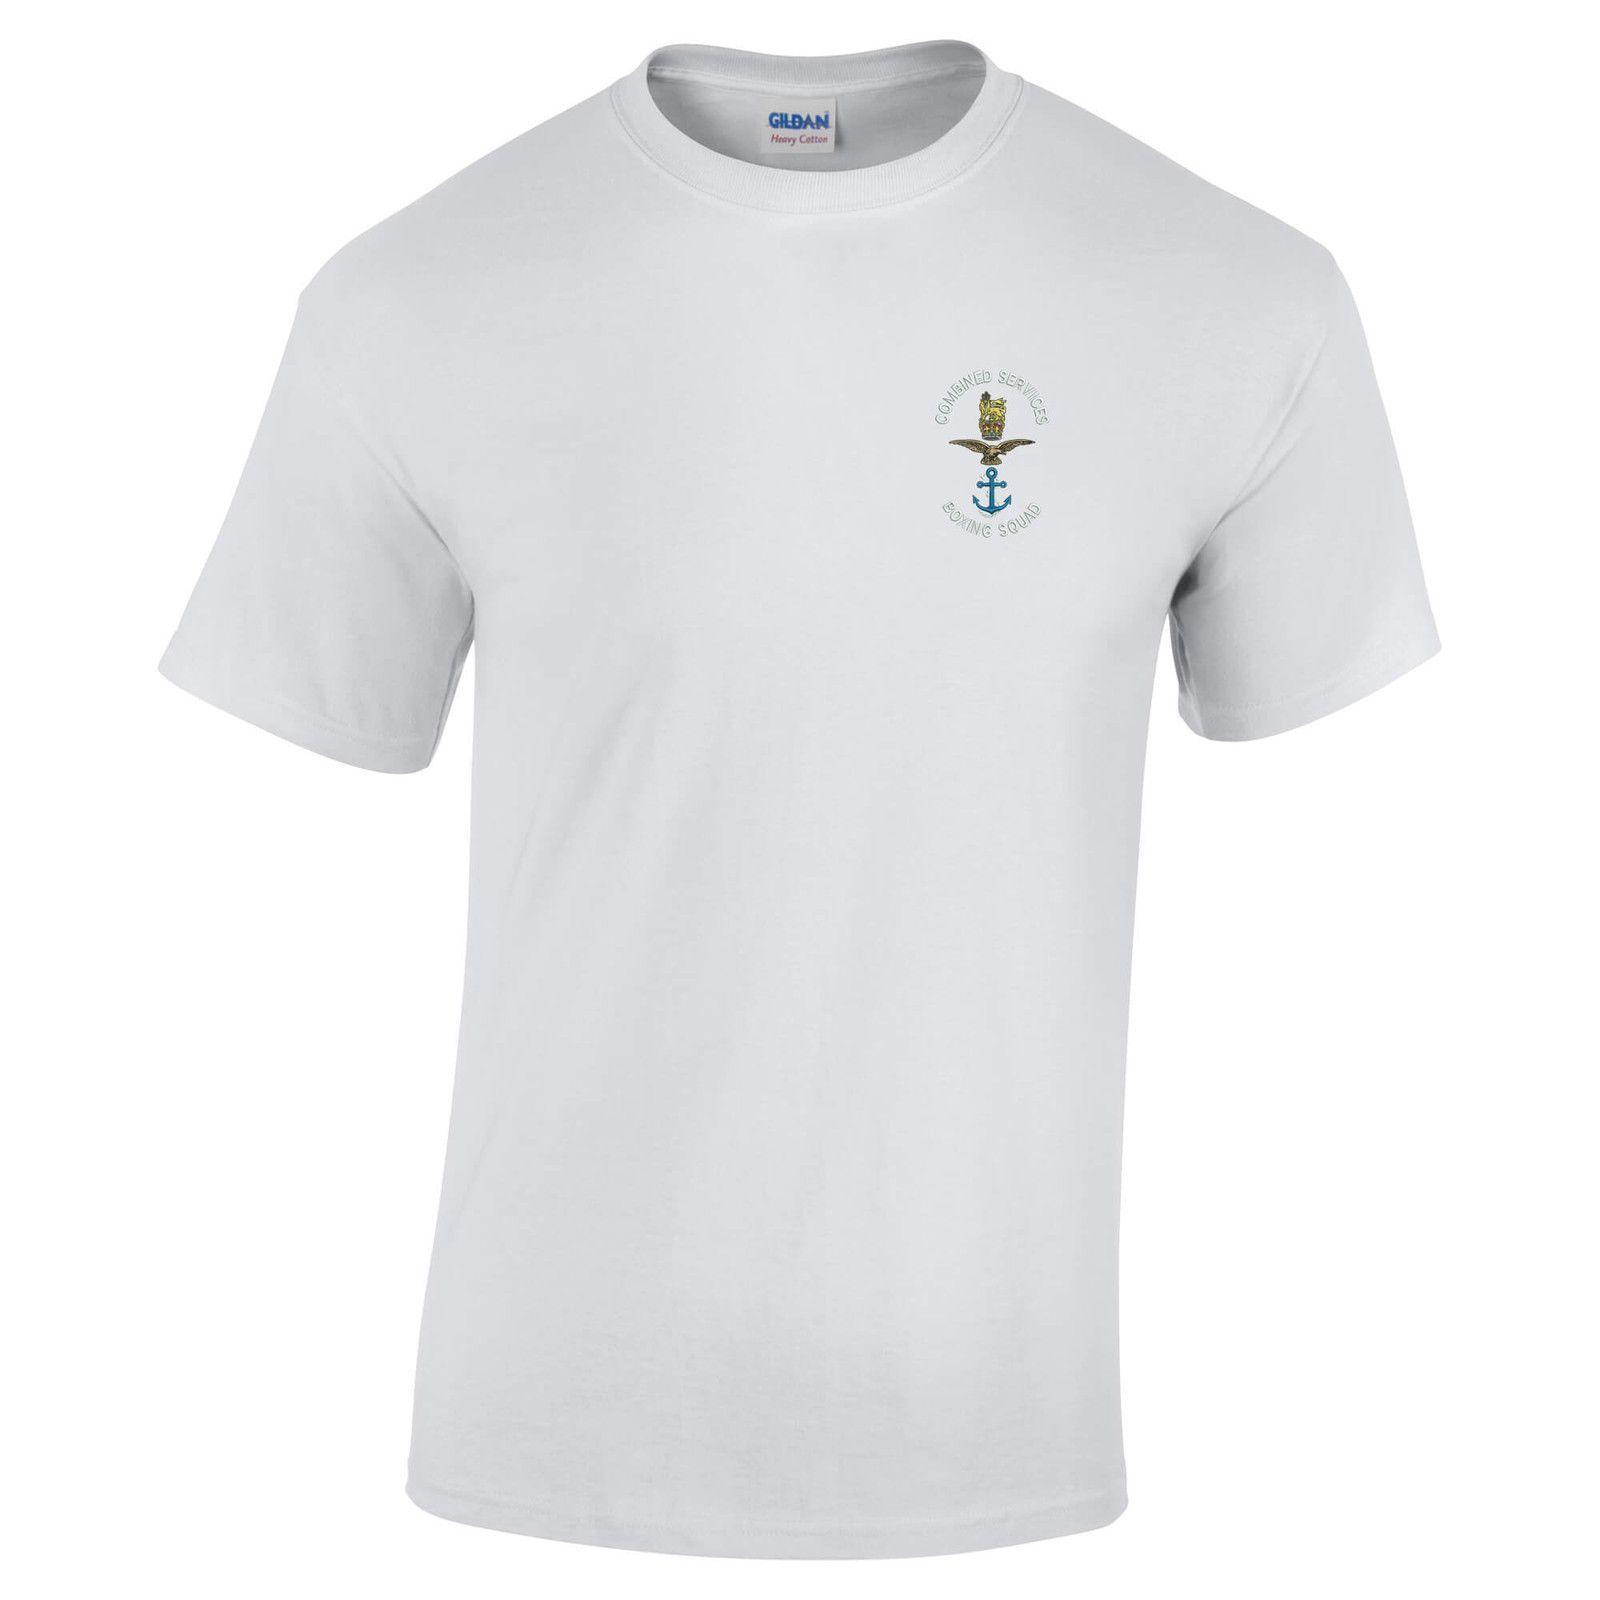 f8ba25f66 Combined Services Boxing Squad T Shirt Men Women Unisex Fashion Tshirt  Graphic T Shirts Custom Shirt From Designtshirts201809, $13.91| DHgate.Com